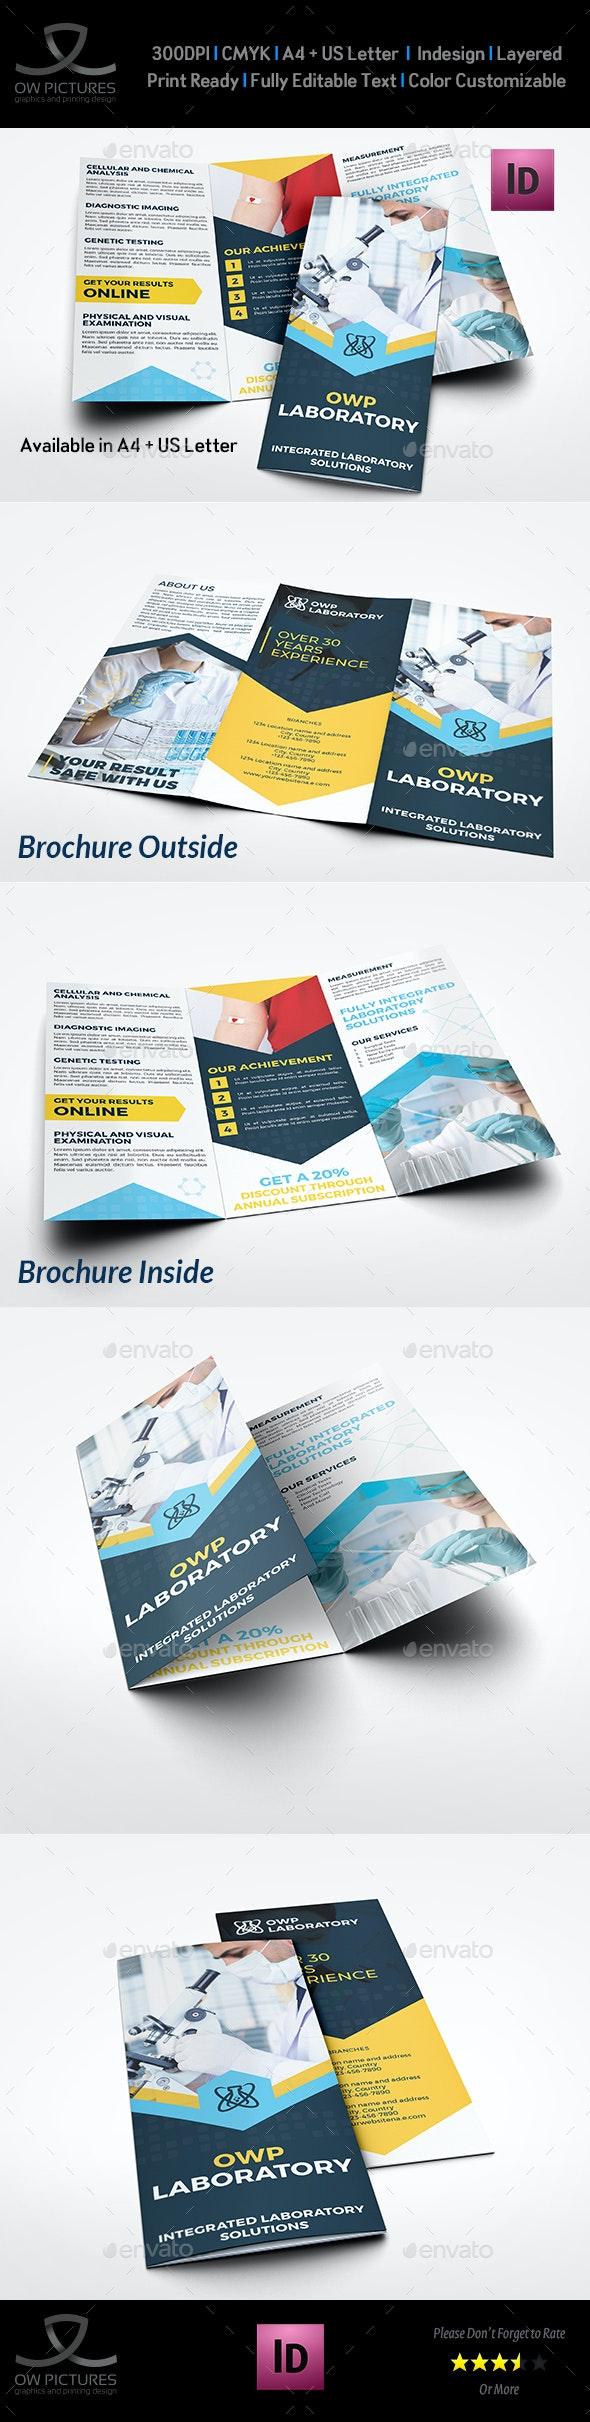 Medical Laboratory Tri-Fold Brochure Template - Brochures Print Templates